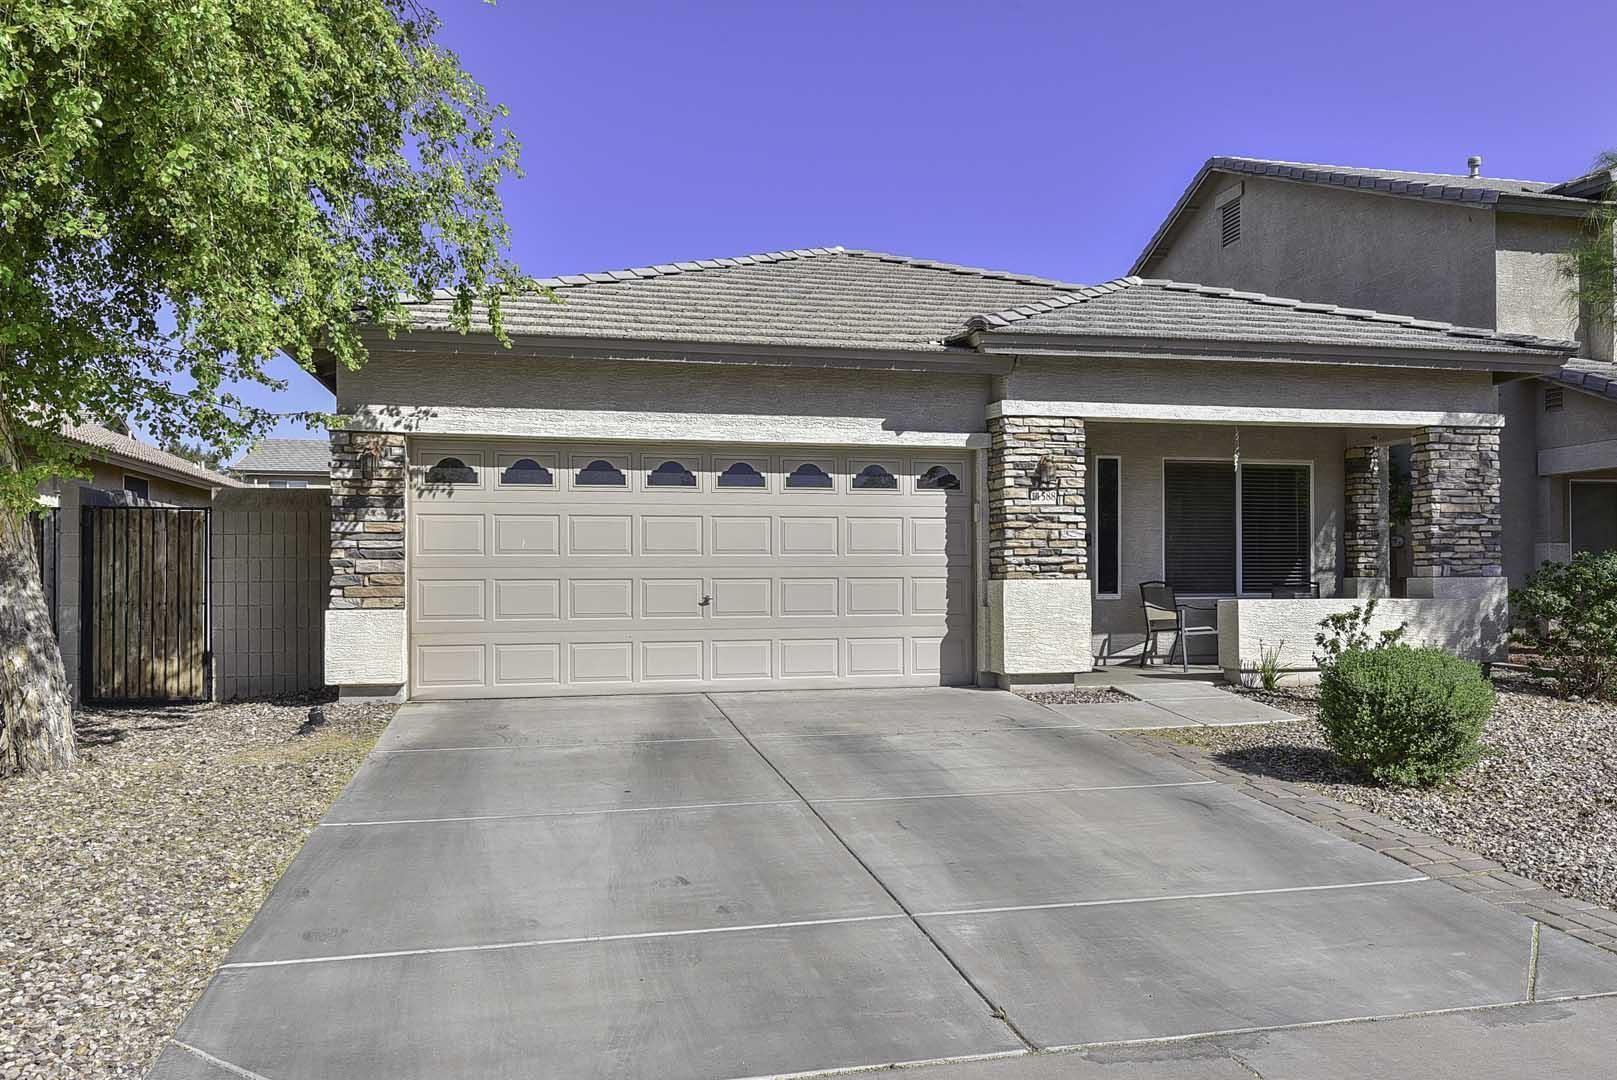 Photo of 11588 W HARRISON Street, Avondale, AZ 85323 (MLS # 6230278)